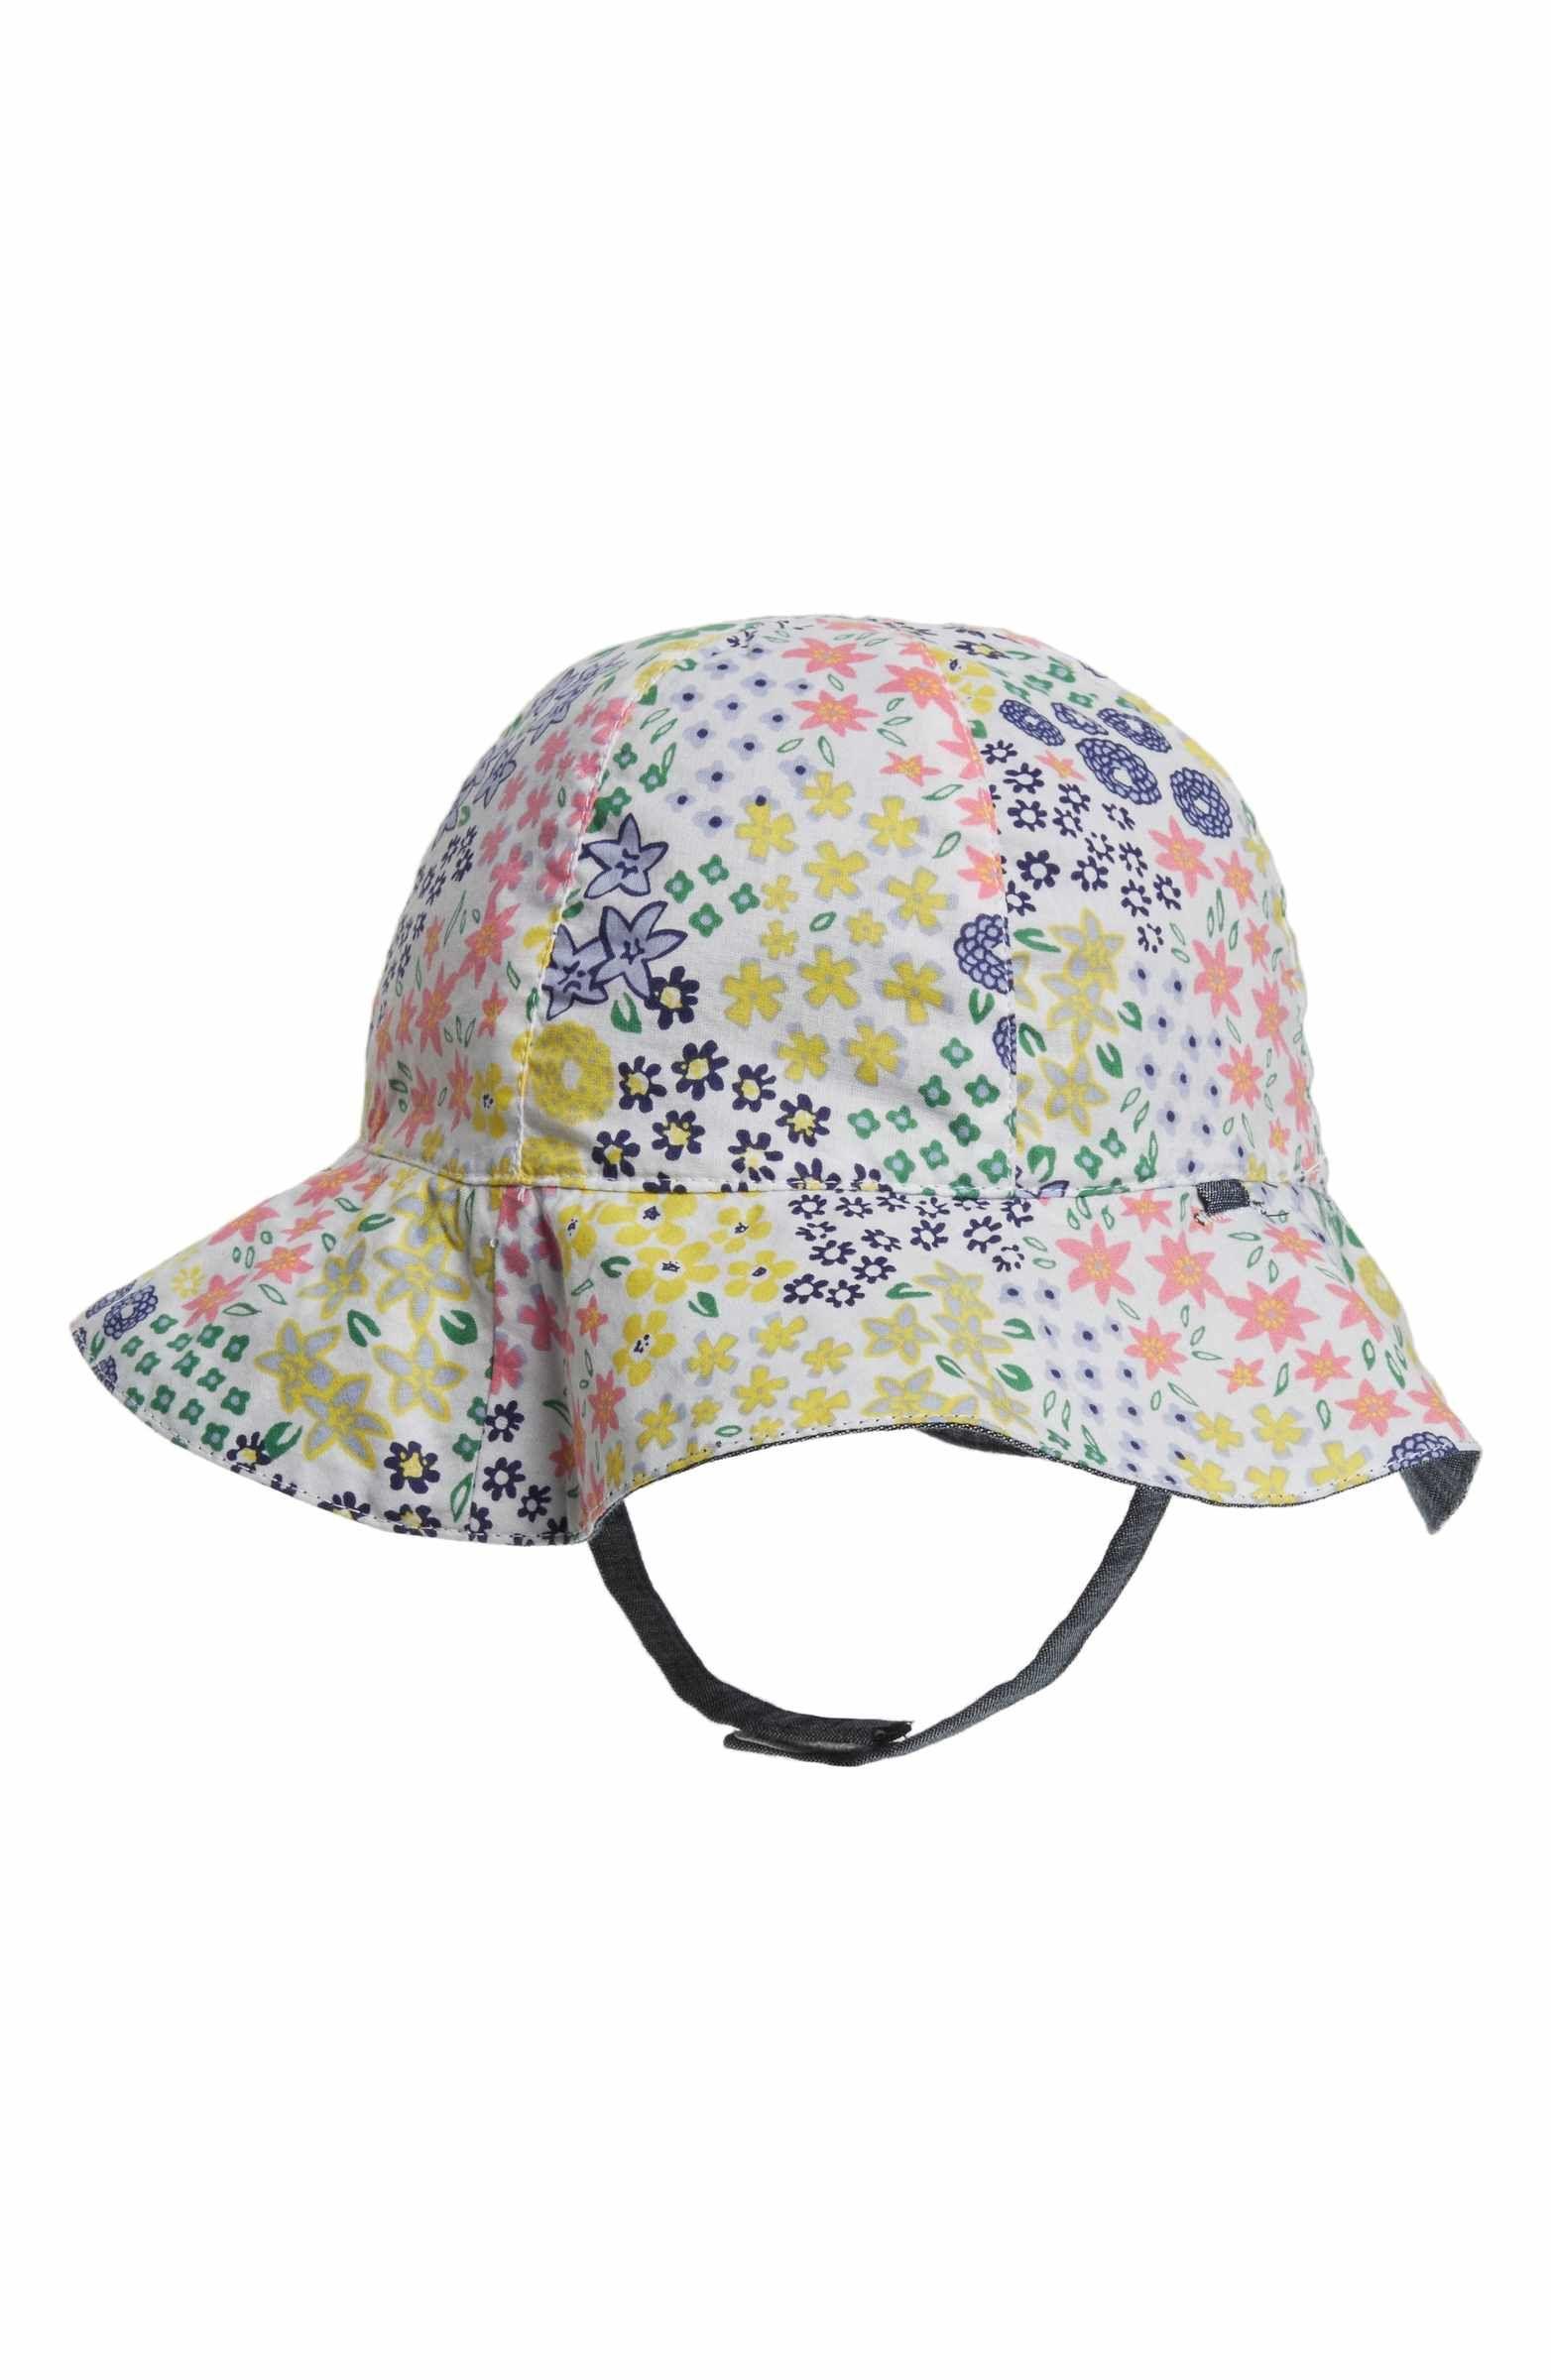 9a9cbdcdd0e Main Image - Tucker + Tate Reversible Sun Hat (Baby Girls)